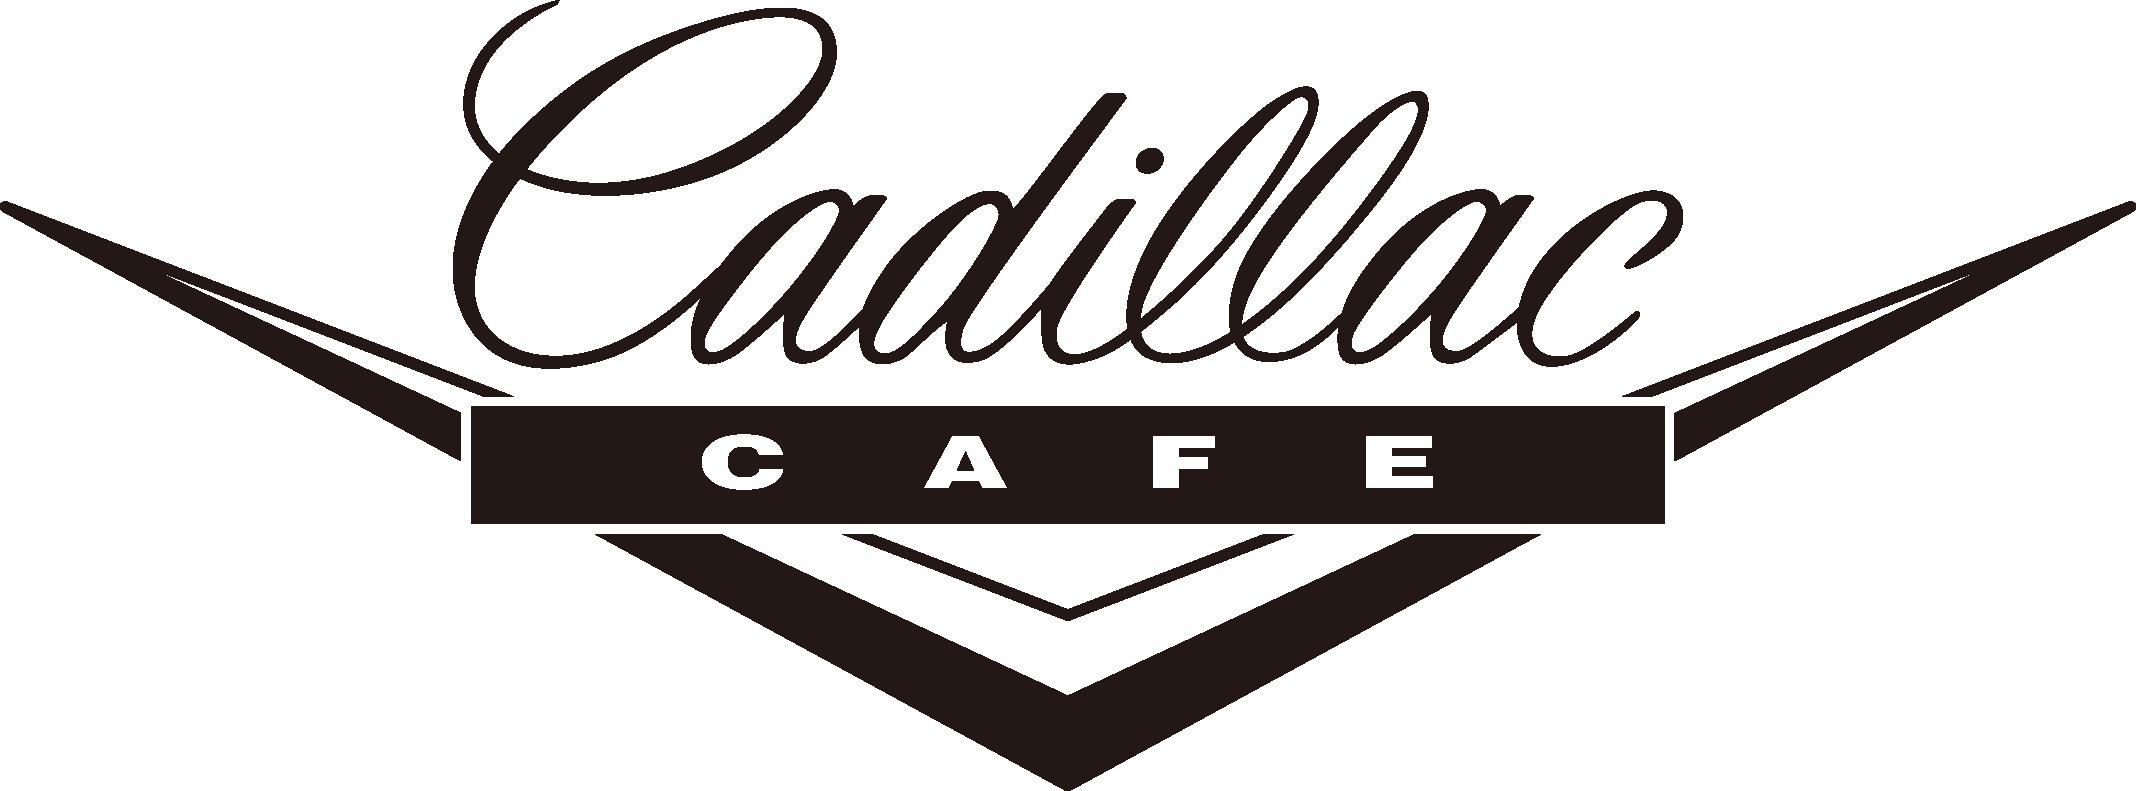 Cadillac Cafe logo.png